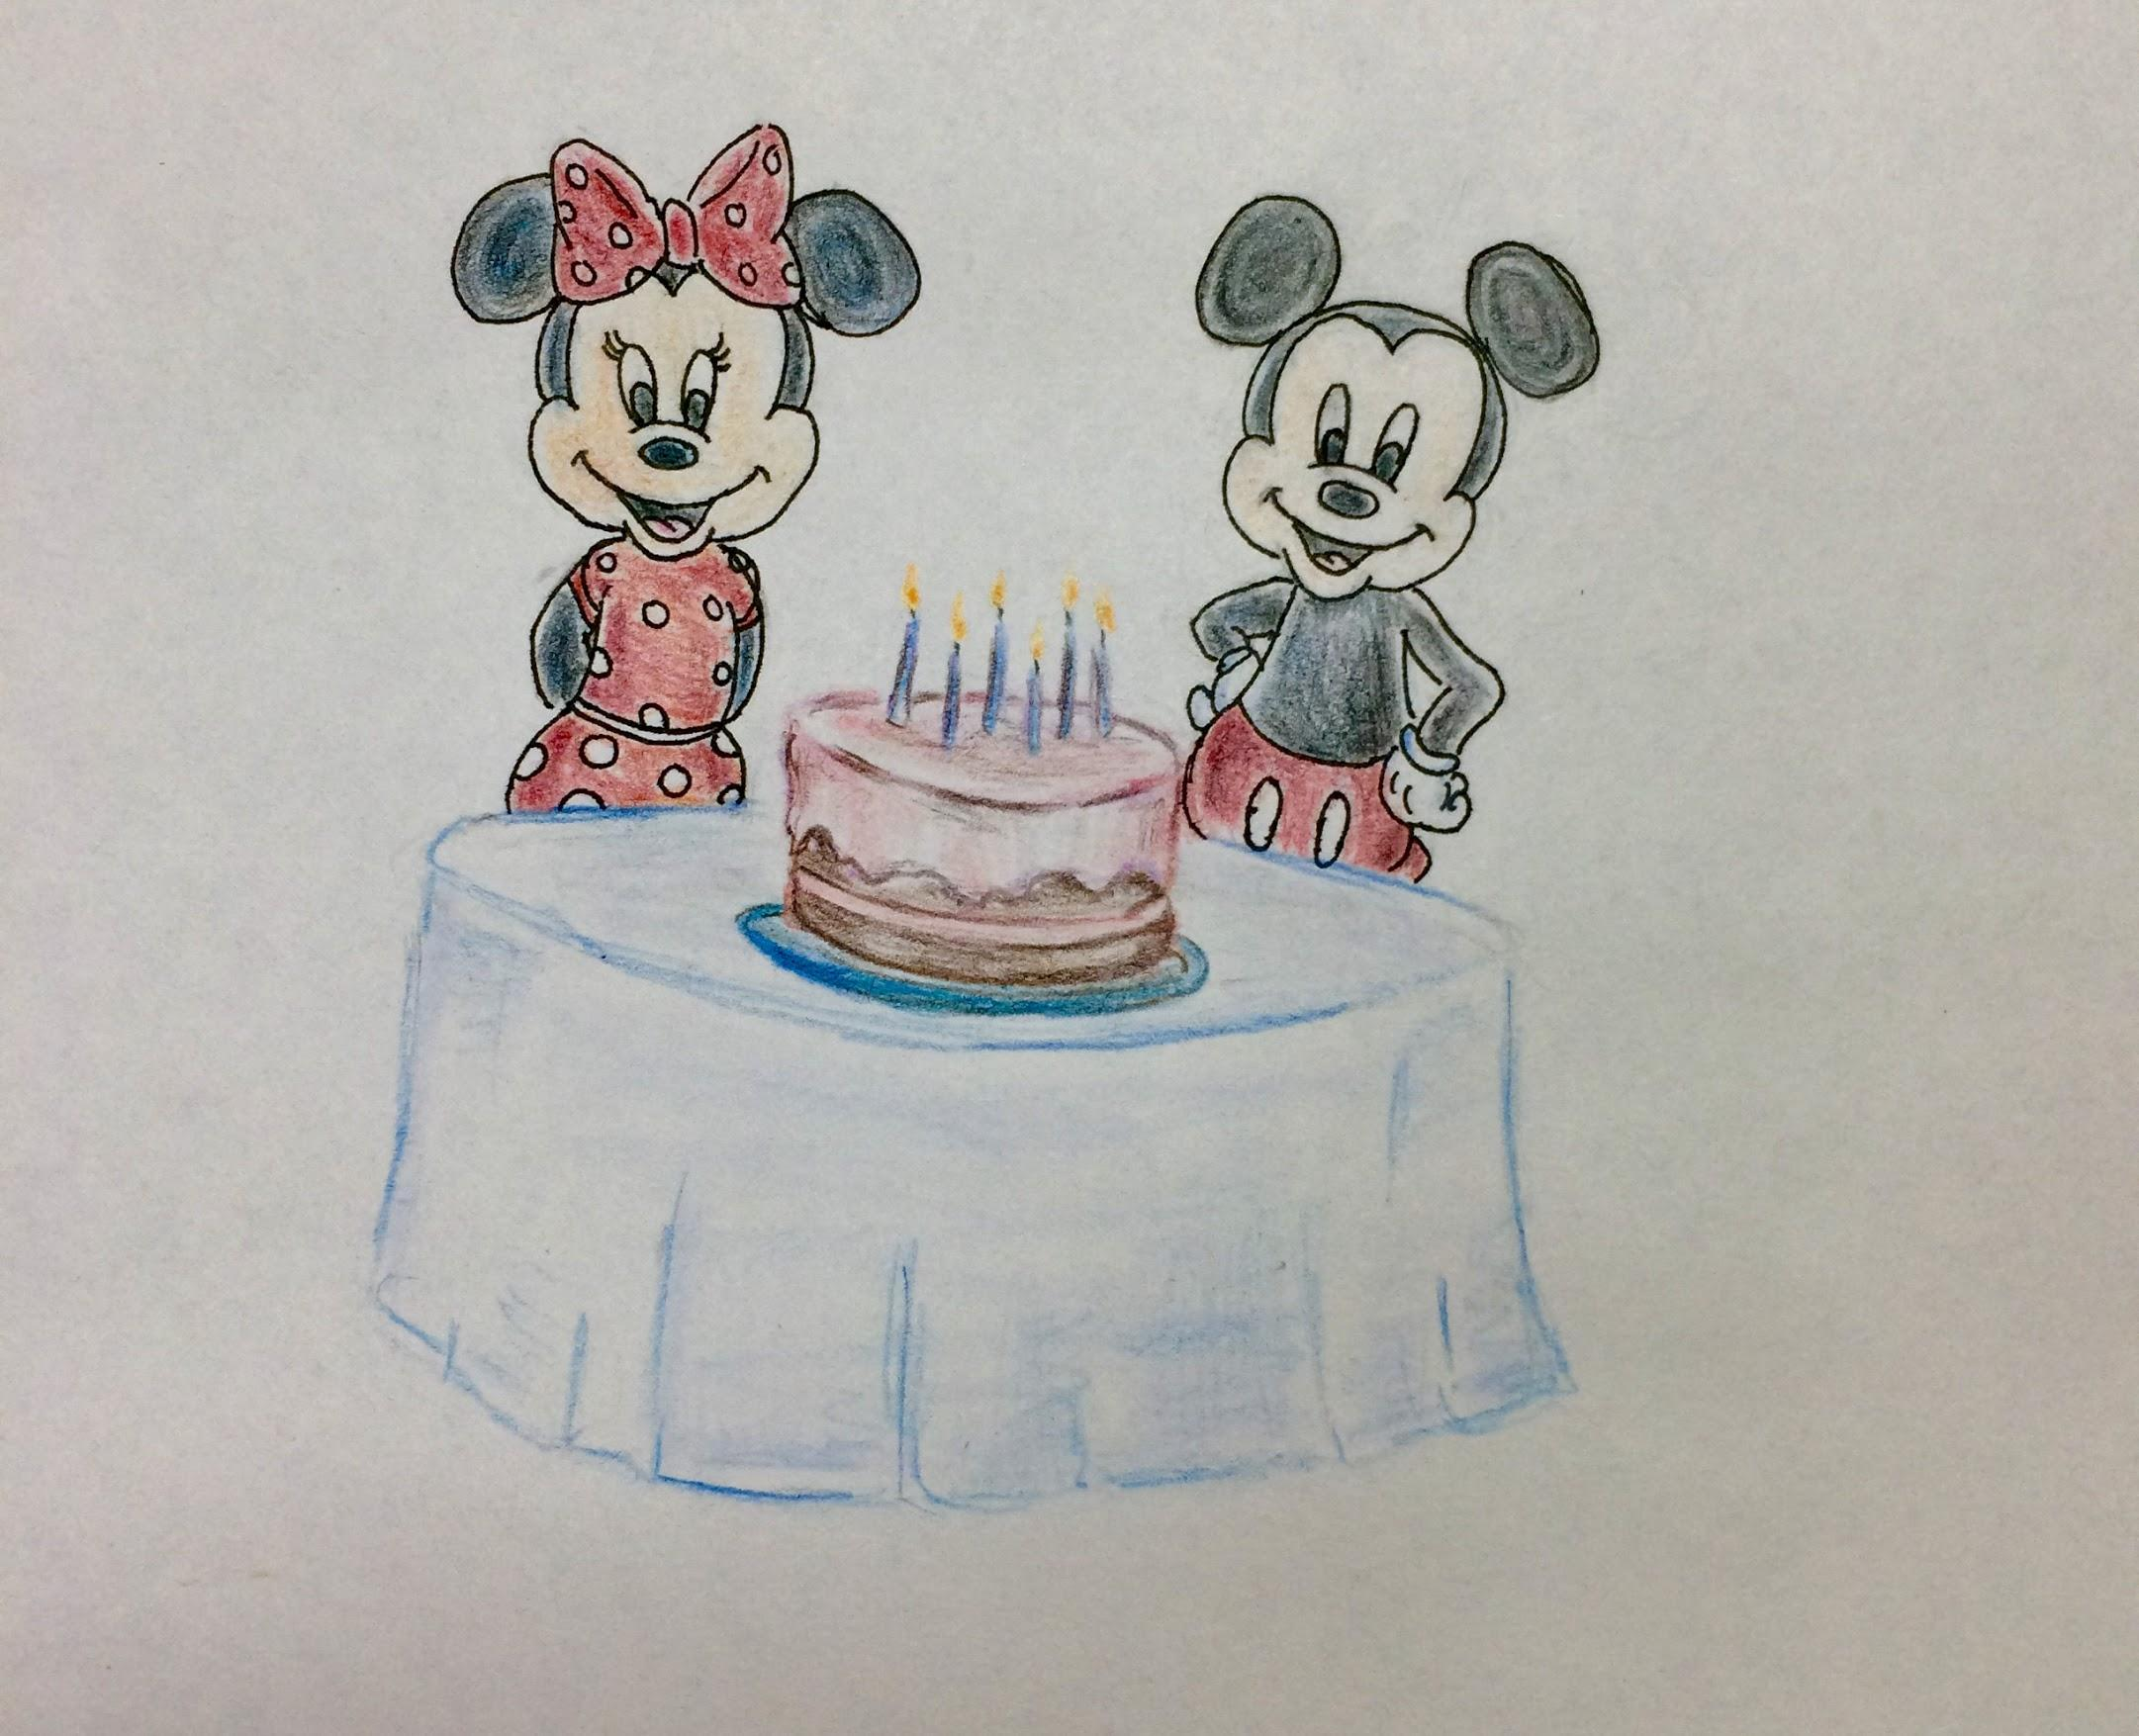 Mickey and Minnie Illustration